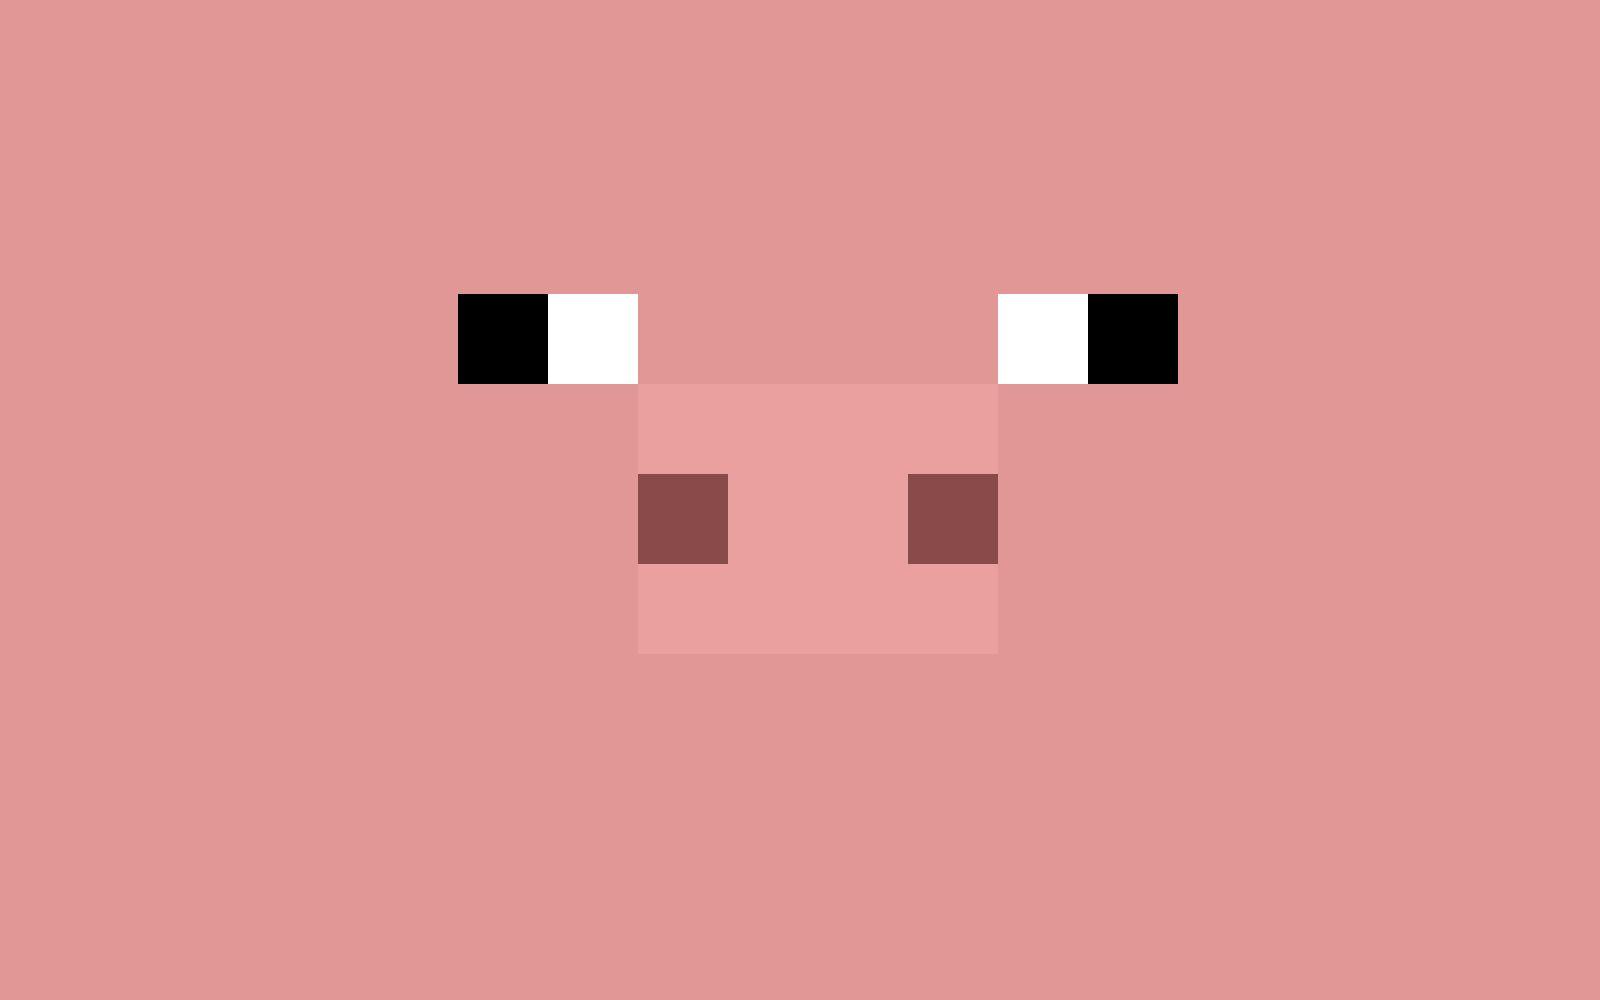 Dont Judge Me Minecraft Pig Minecraft Wallpaper Minecraft Pig Face